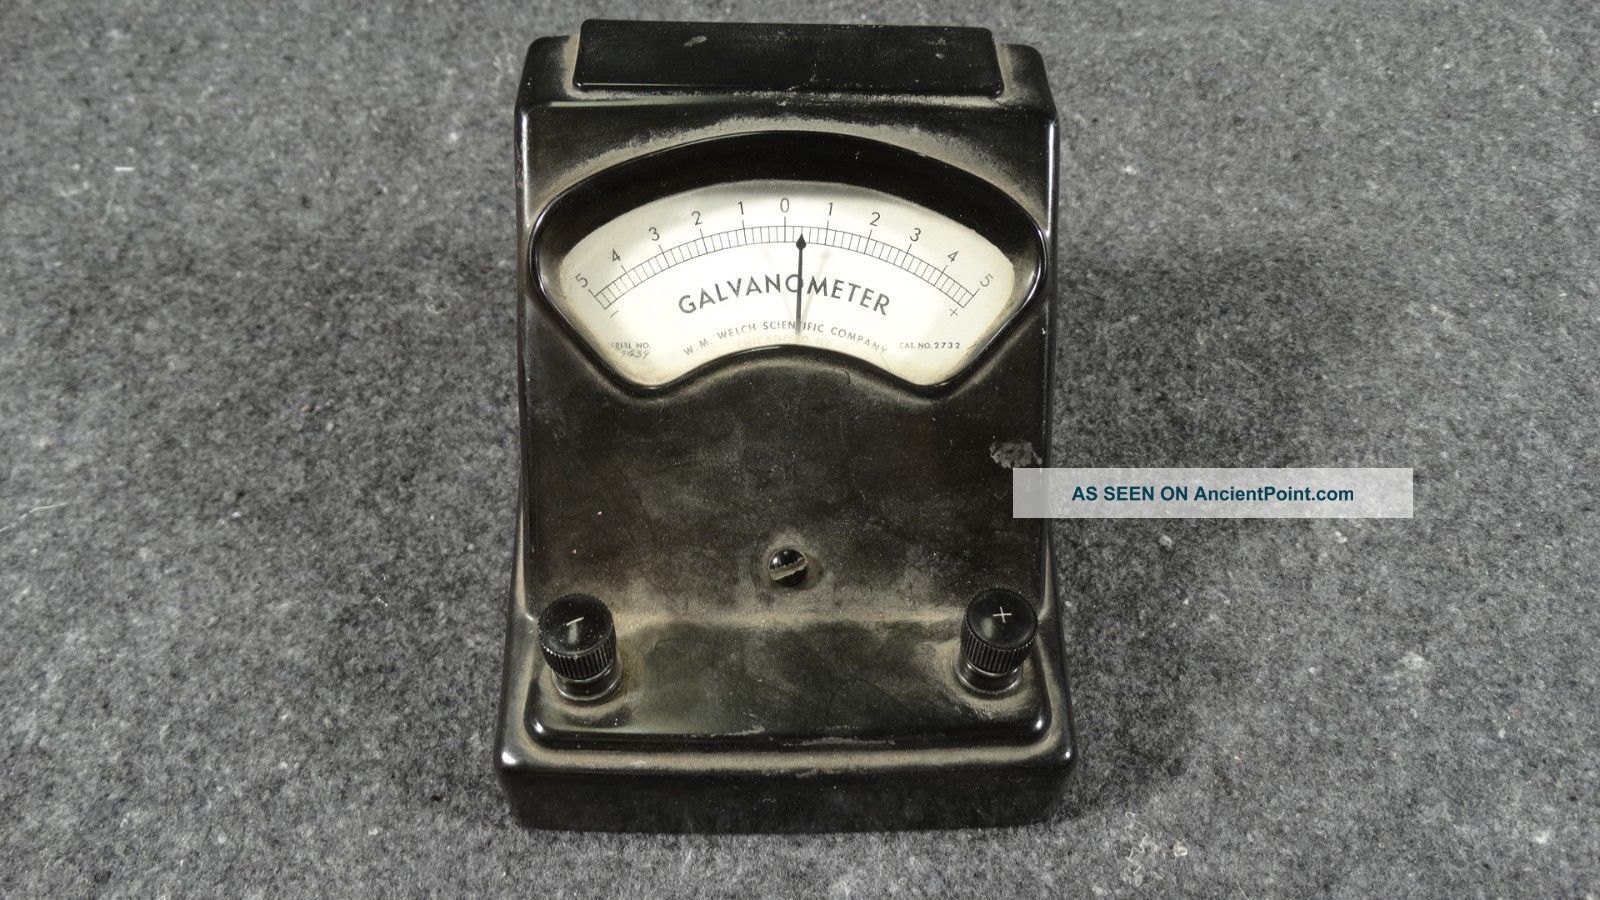 (b7) Vtg Welch Scientific 2732 Galvanometer Bakelite Case Science Lab Steam Punk Other Antique Science Equip photo